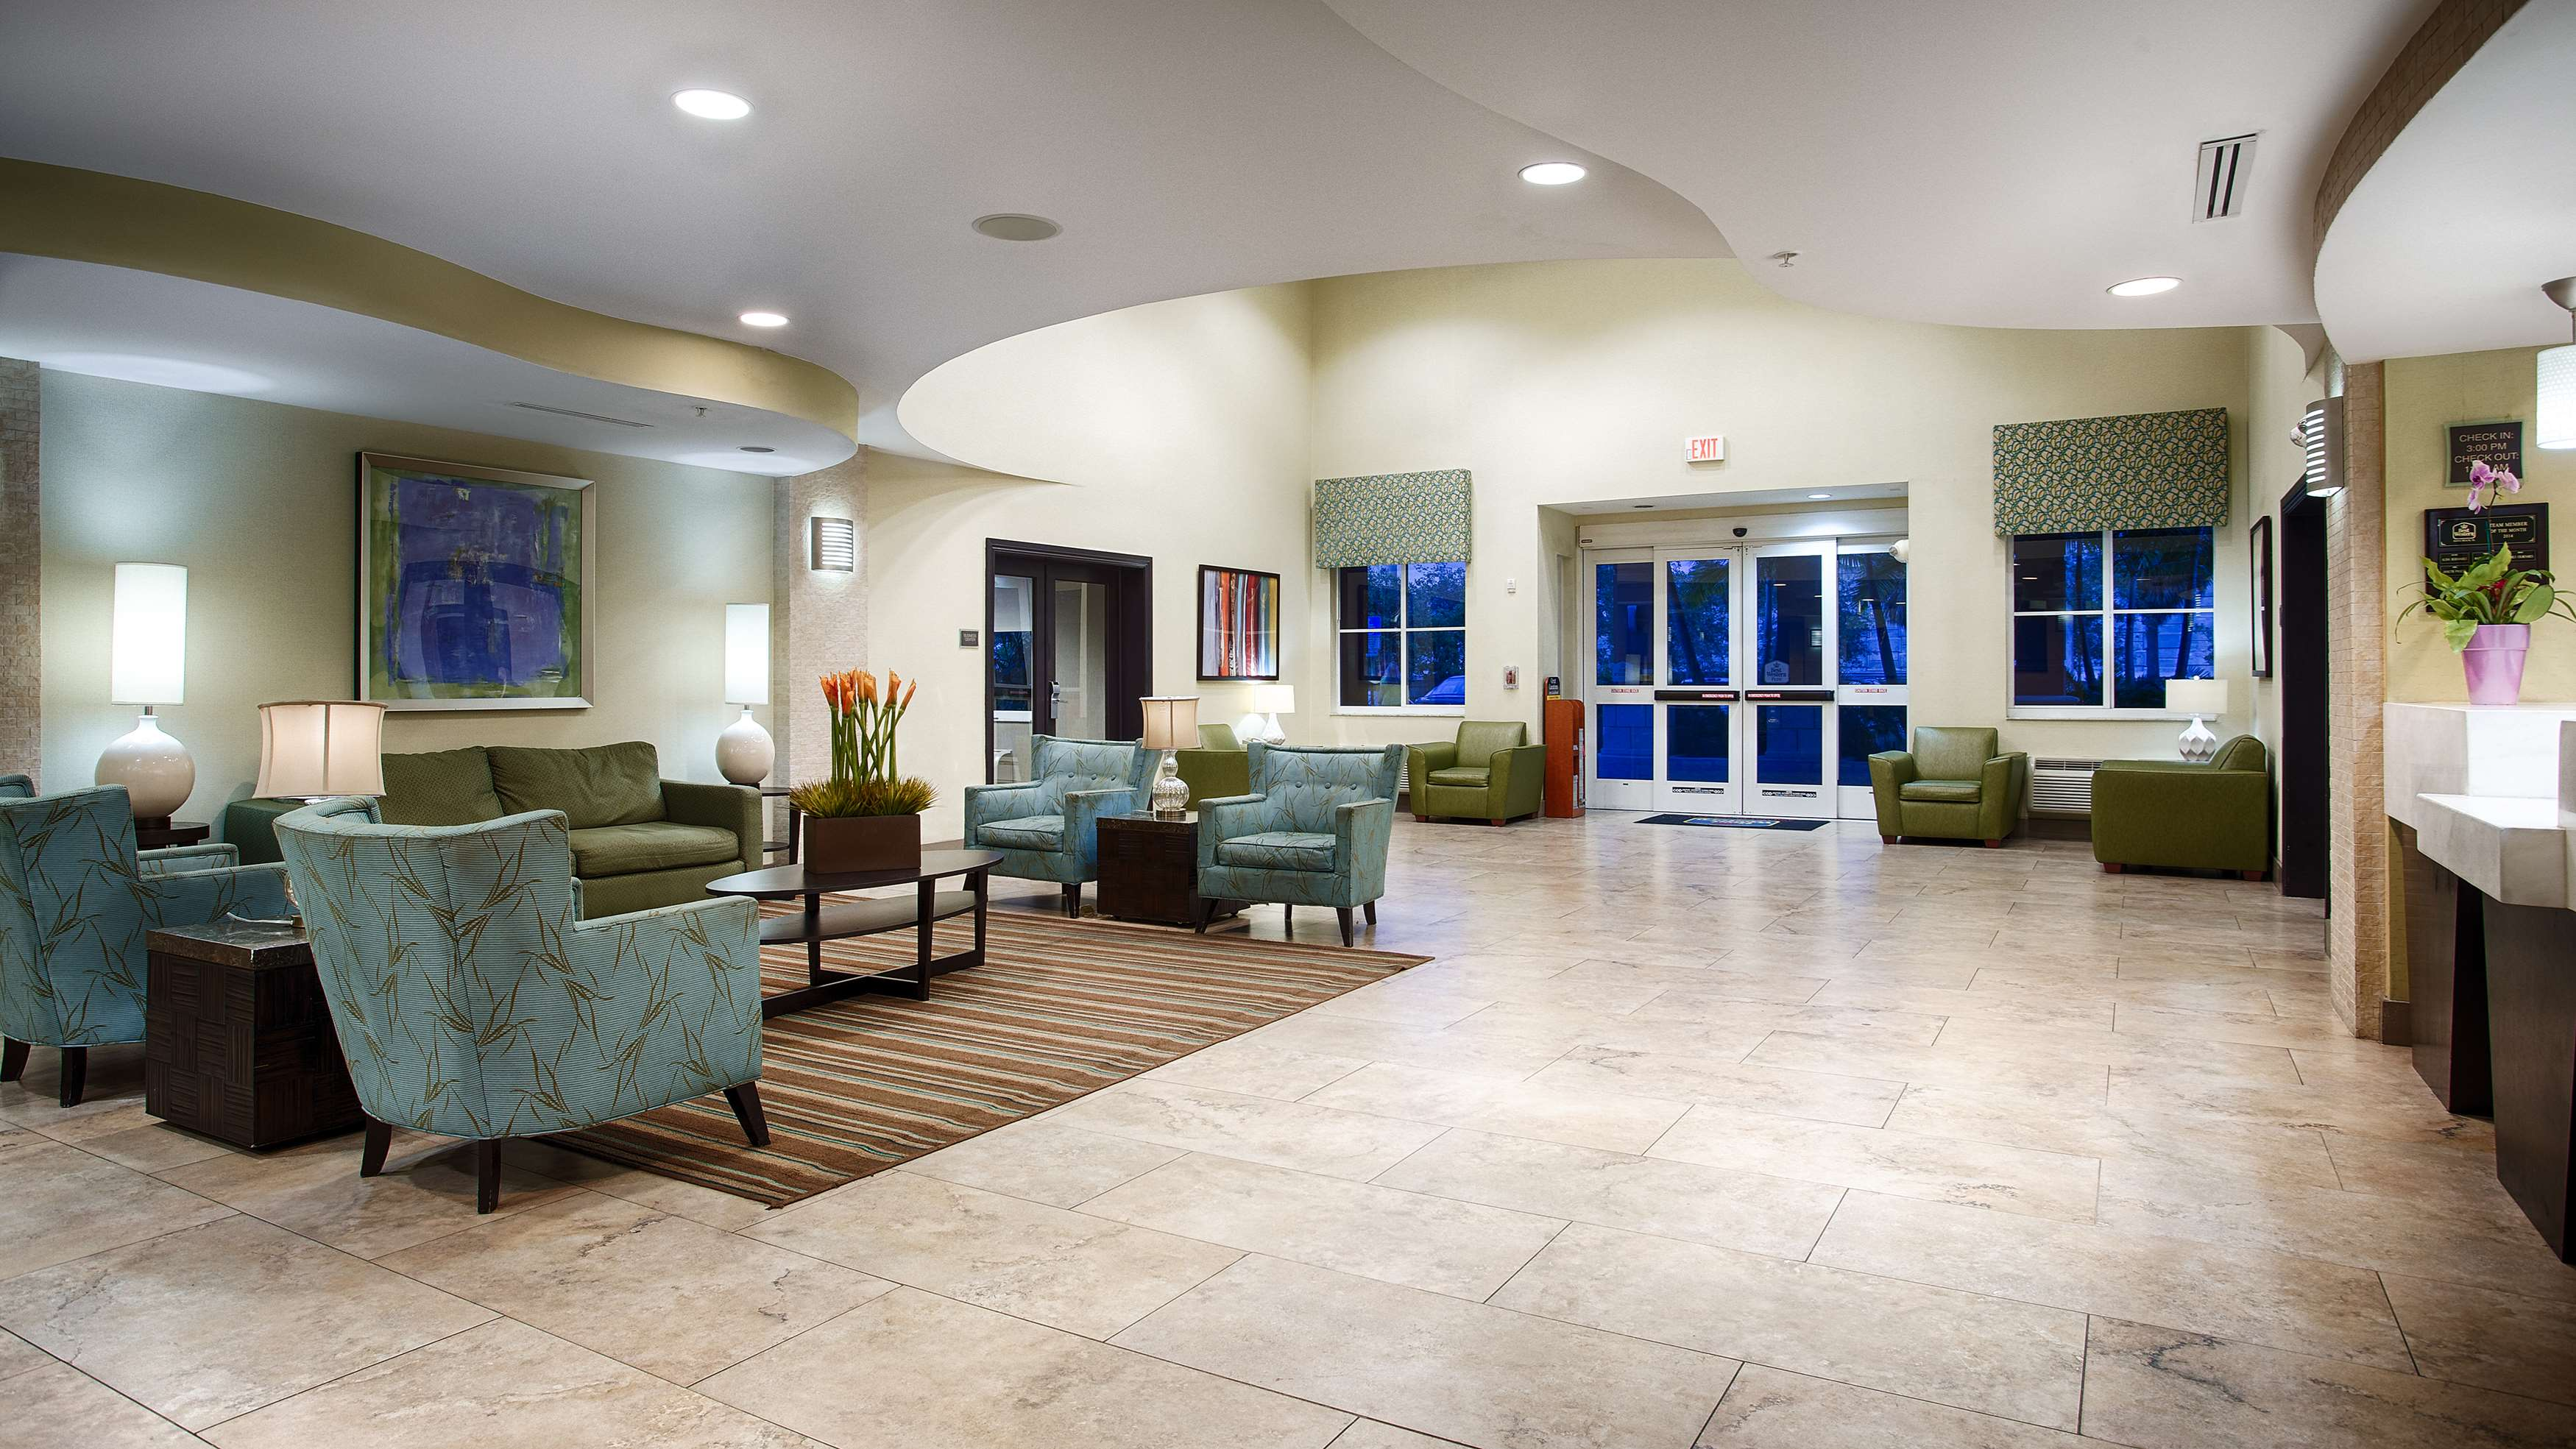 Best Western Plus Fort Lauderdale Airport South Inn & Suites image 8